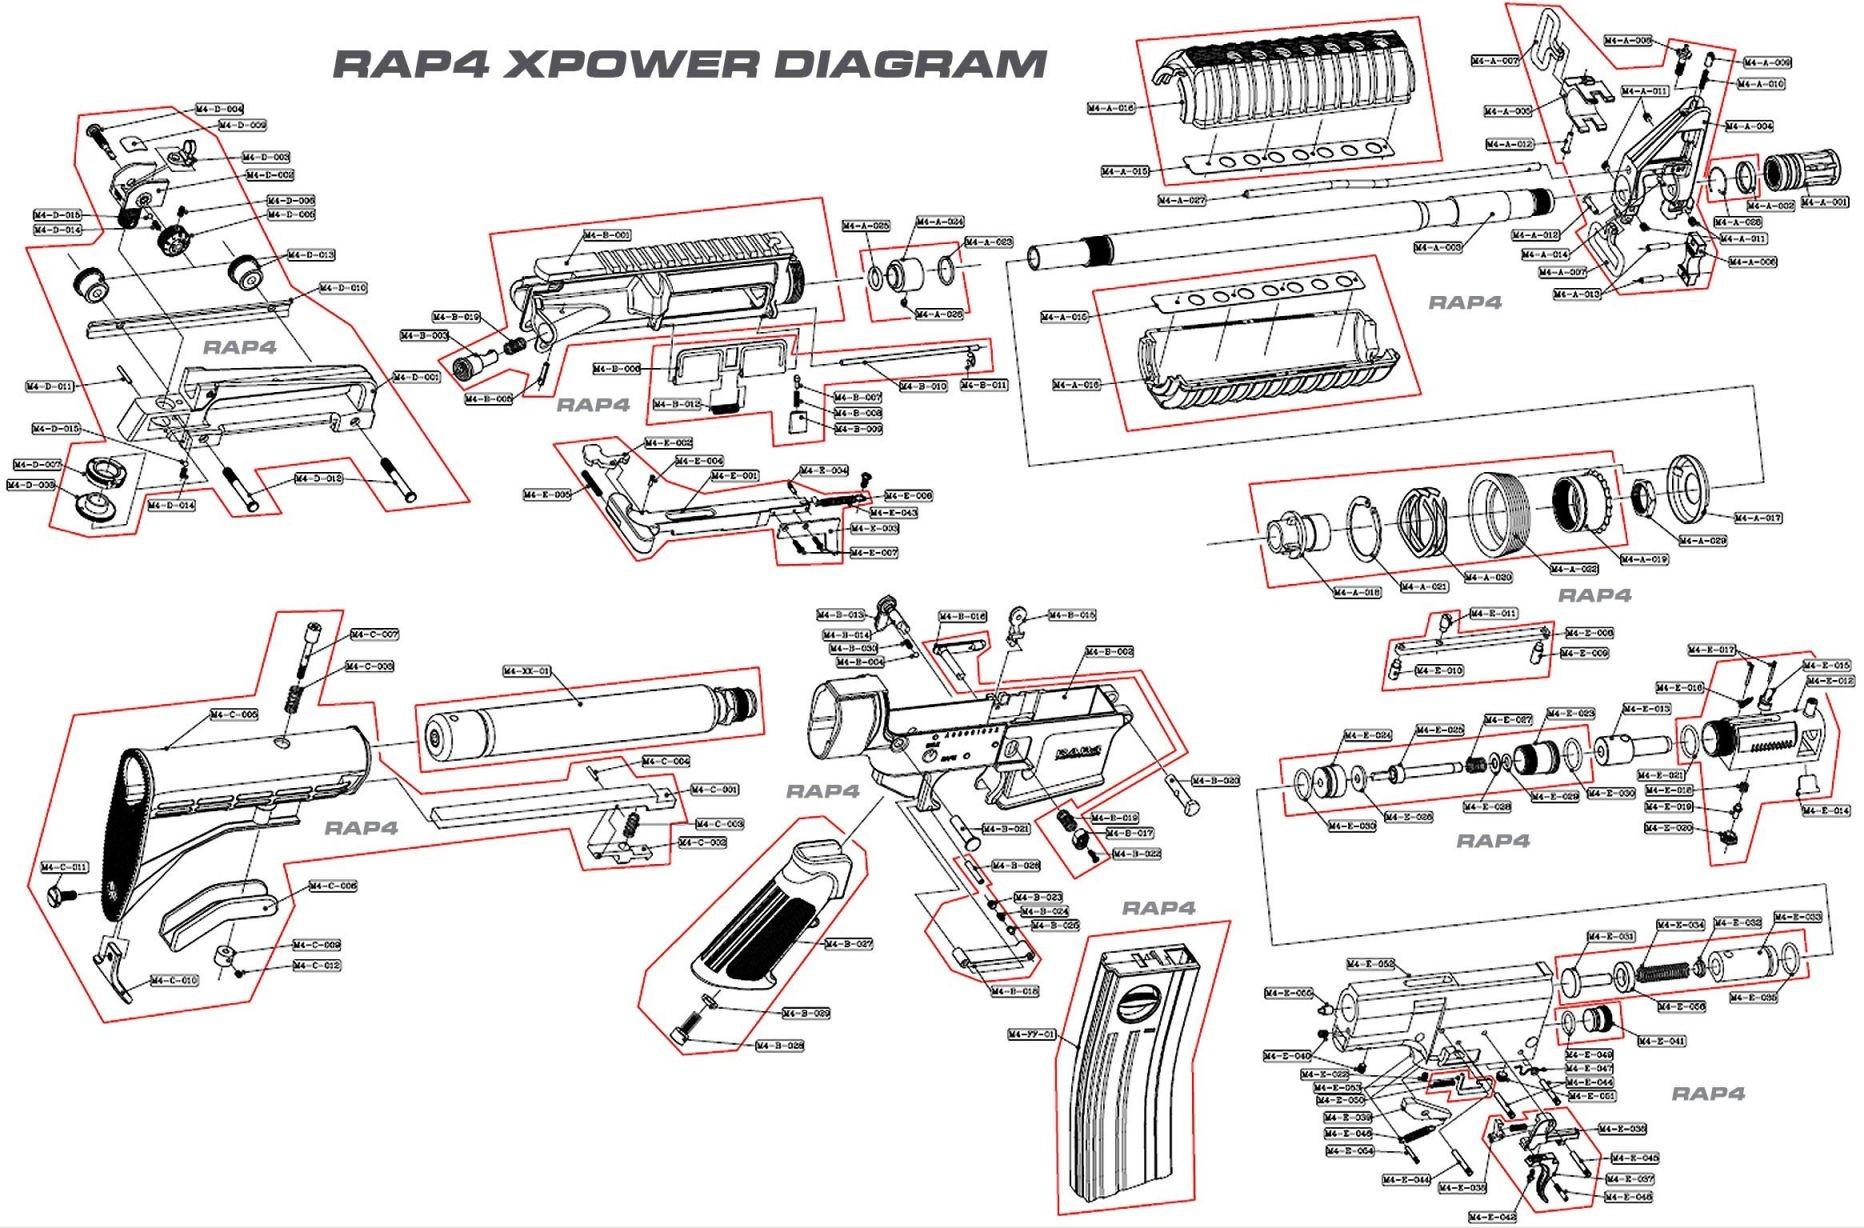 Car Door Part Diagram Beautiful Automobile Body Parts Diagram Eq69 – Documentaries for Change Of Car Door Part Diagram